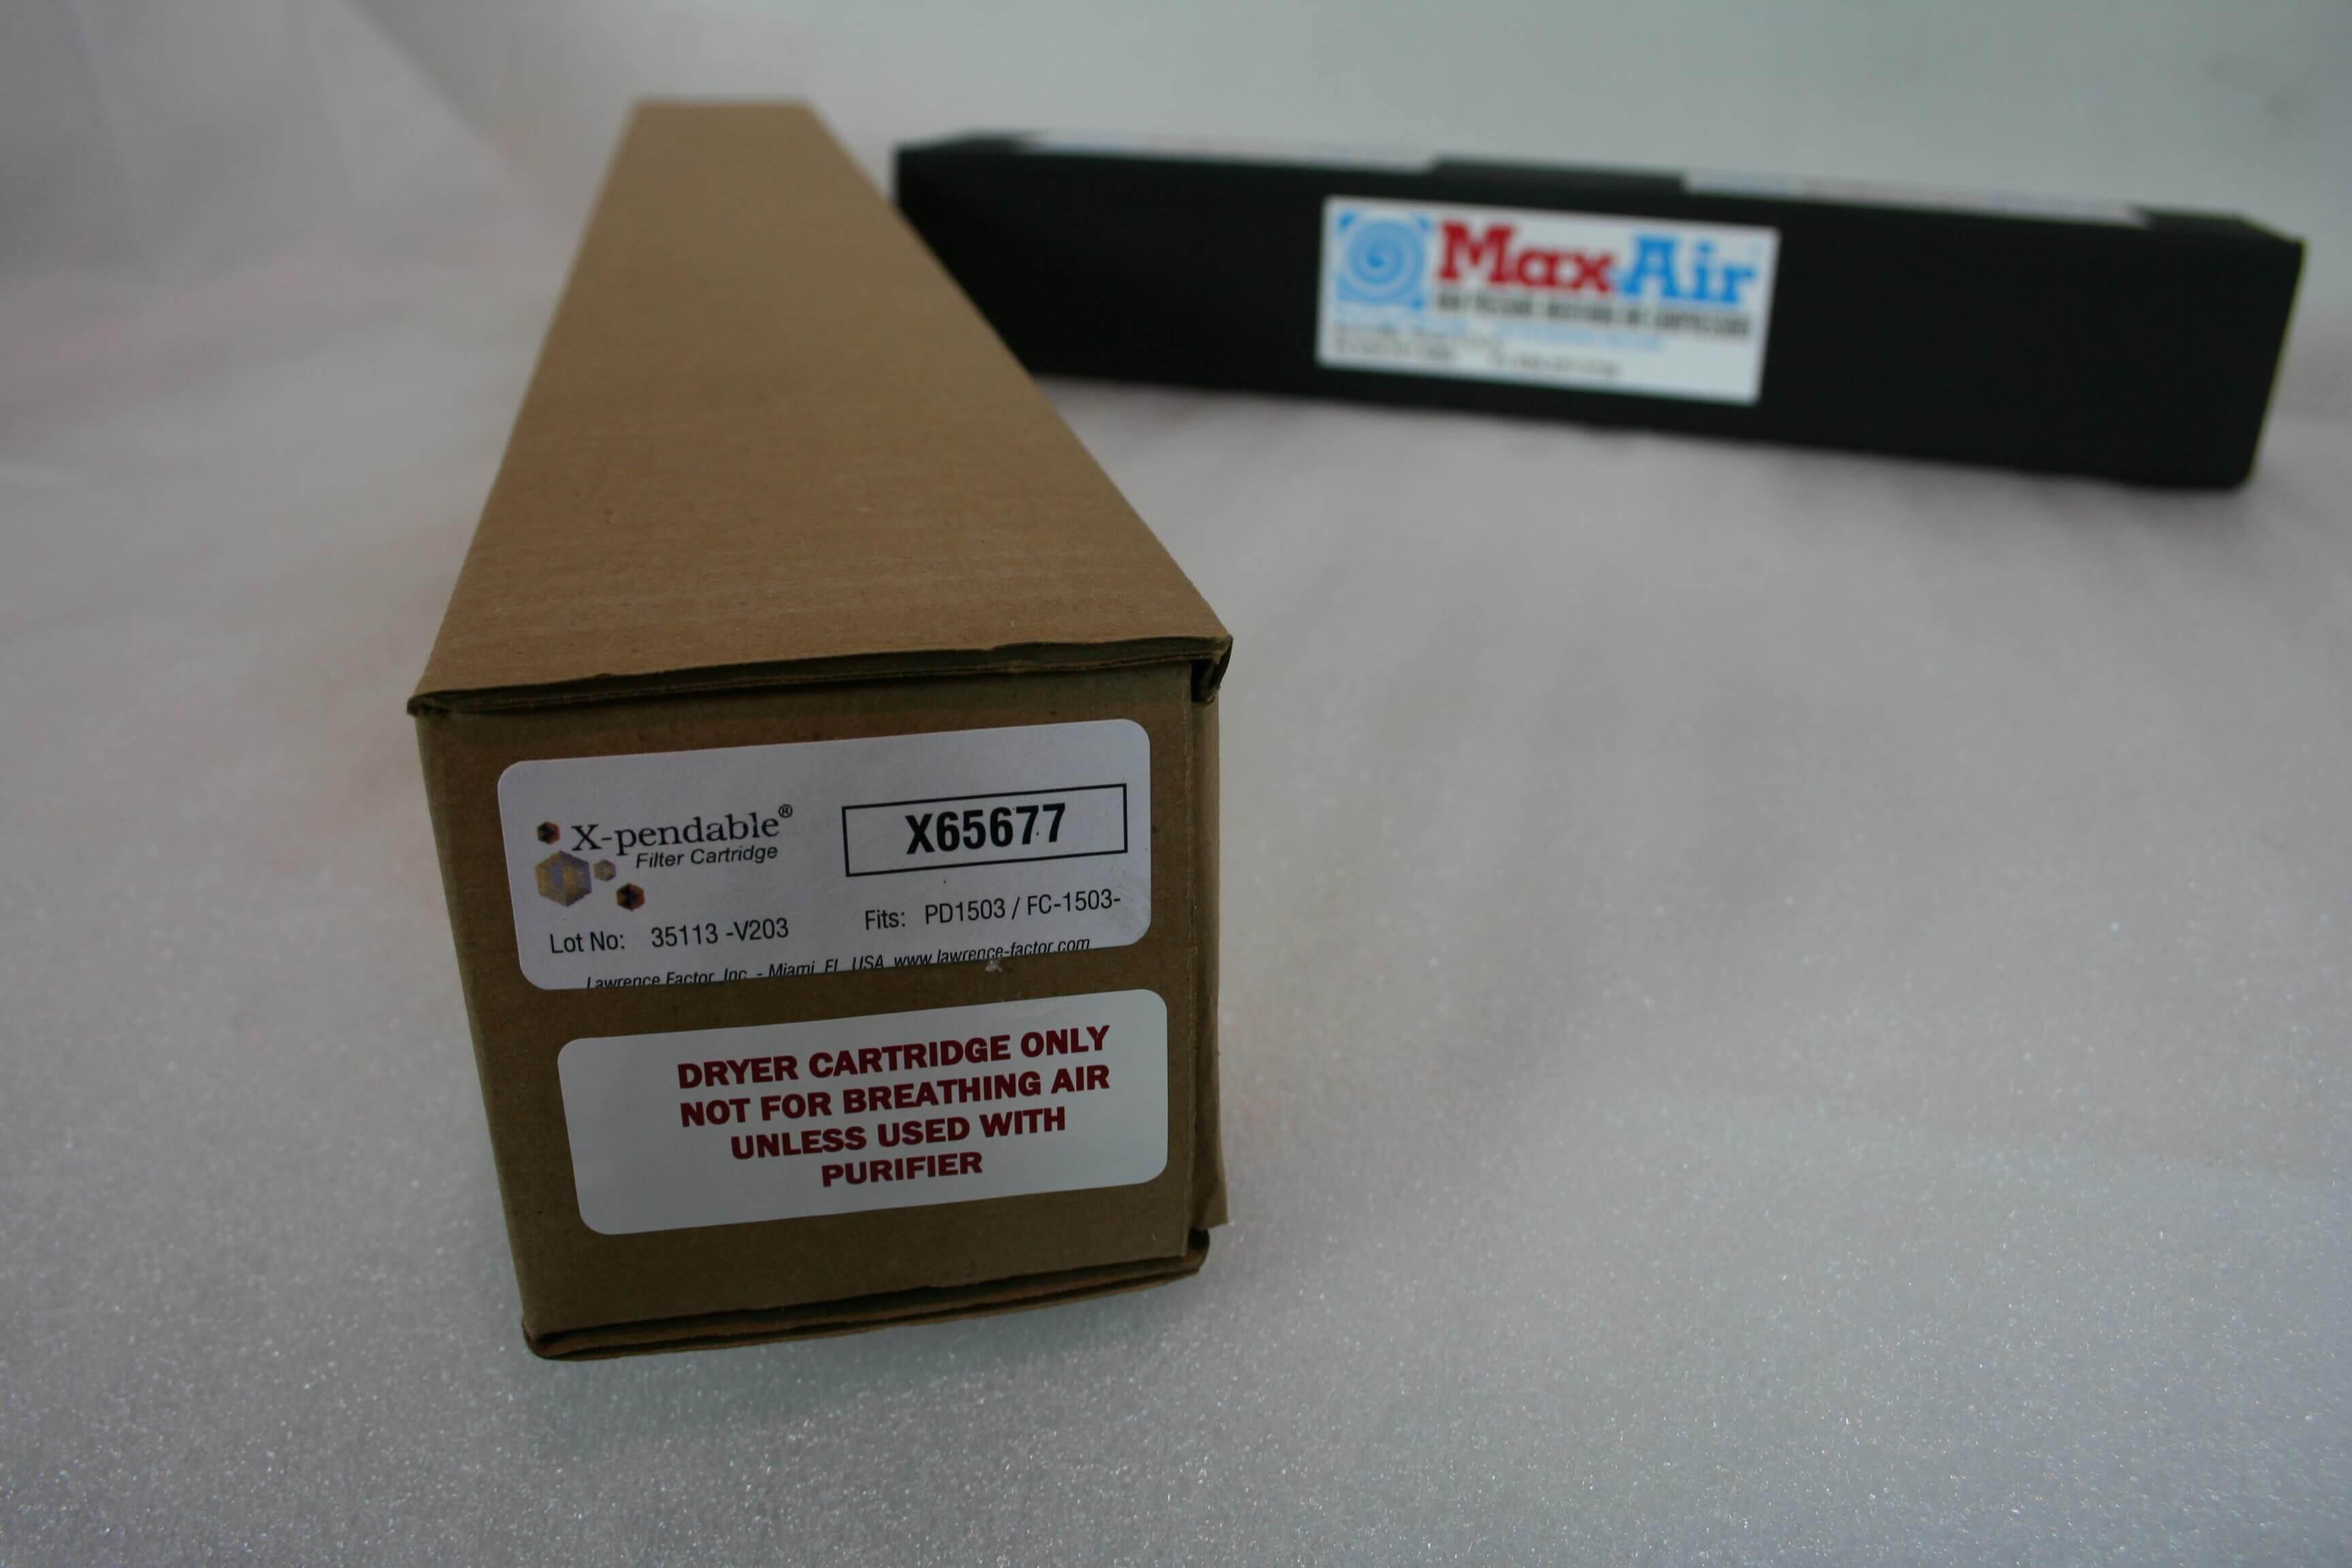 Max-Air 55/90 35,000 CFT Dryer Cartridge LF-65677